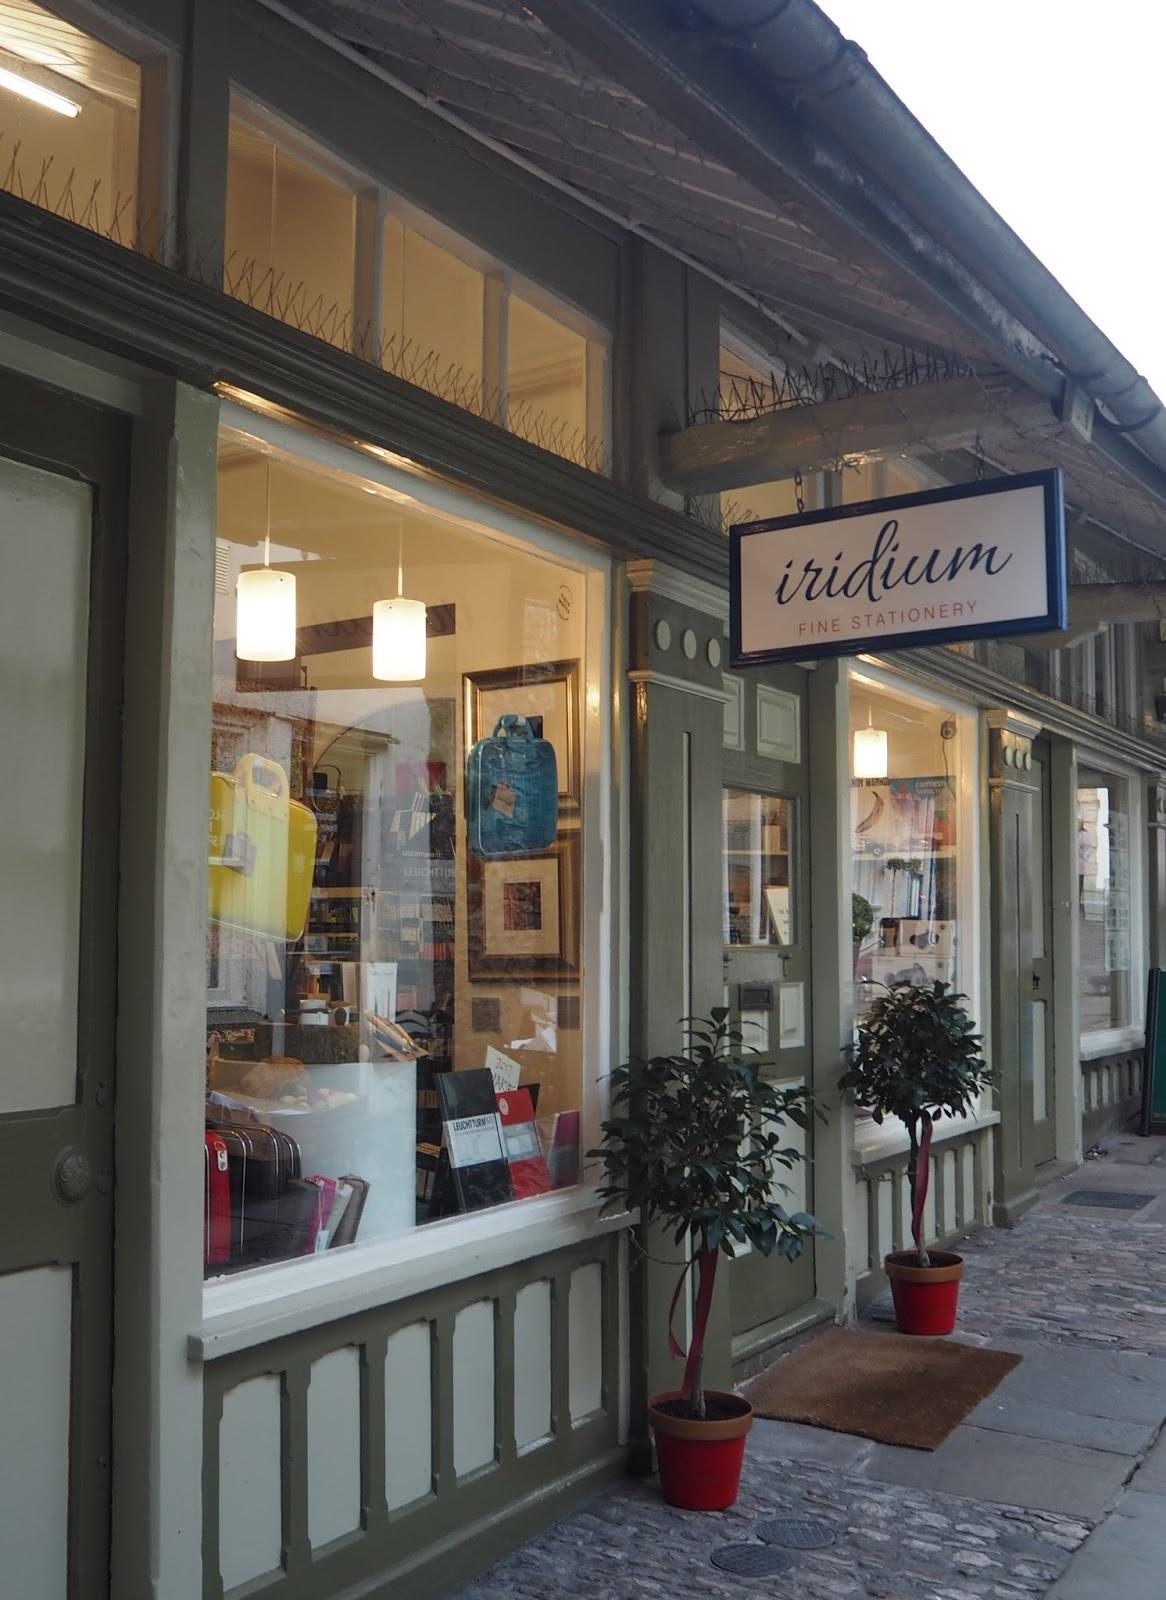 Iridium Fine Stationery, Kendal